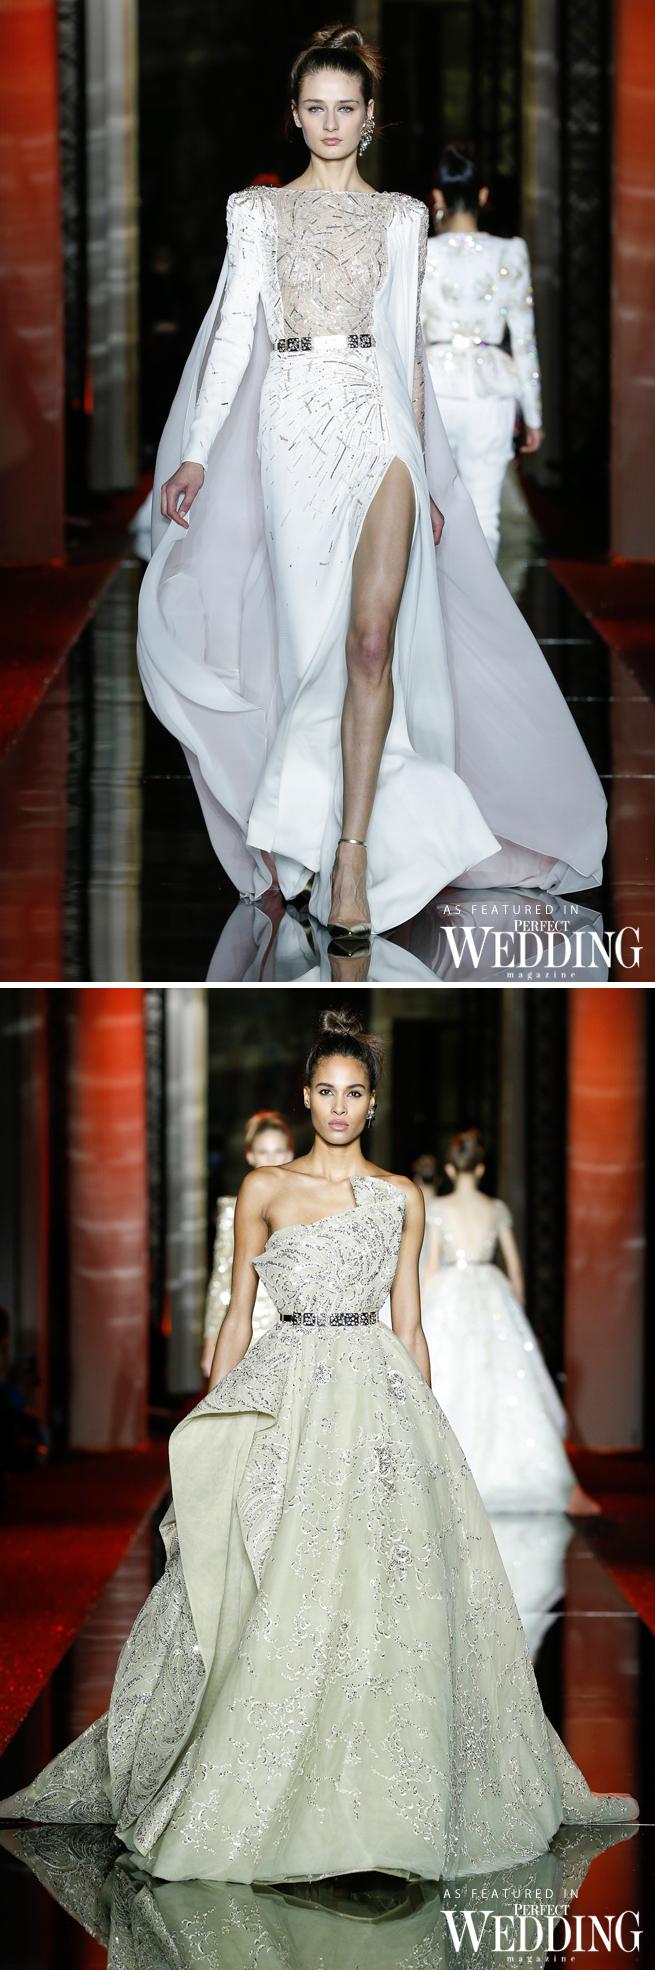 Zuhair Murad, Zuhair Murad Bride, Zuhair Murad Spring Summer 2017 Haute Couture, Paris Fashion Week, Couture Week, Perfect Wedding Magazine, Perfect Wedding Blog, Fires Waltz, Bridal Trends